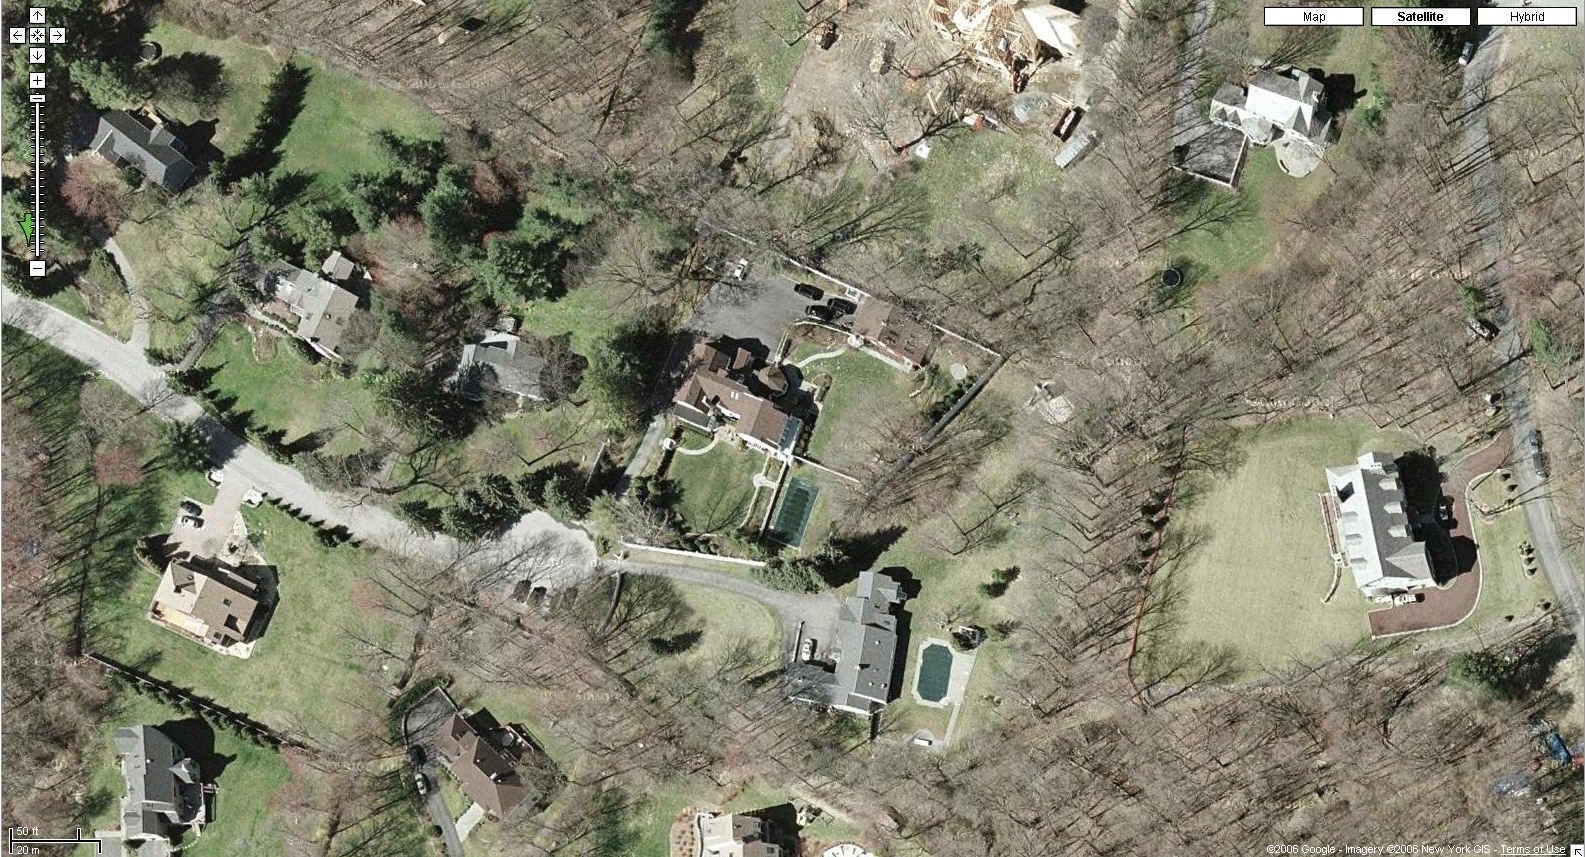 bill clinton house chappaqua eyeballing the pro war clinton residence